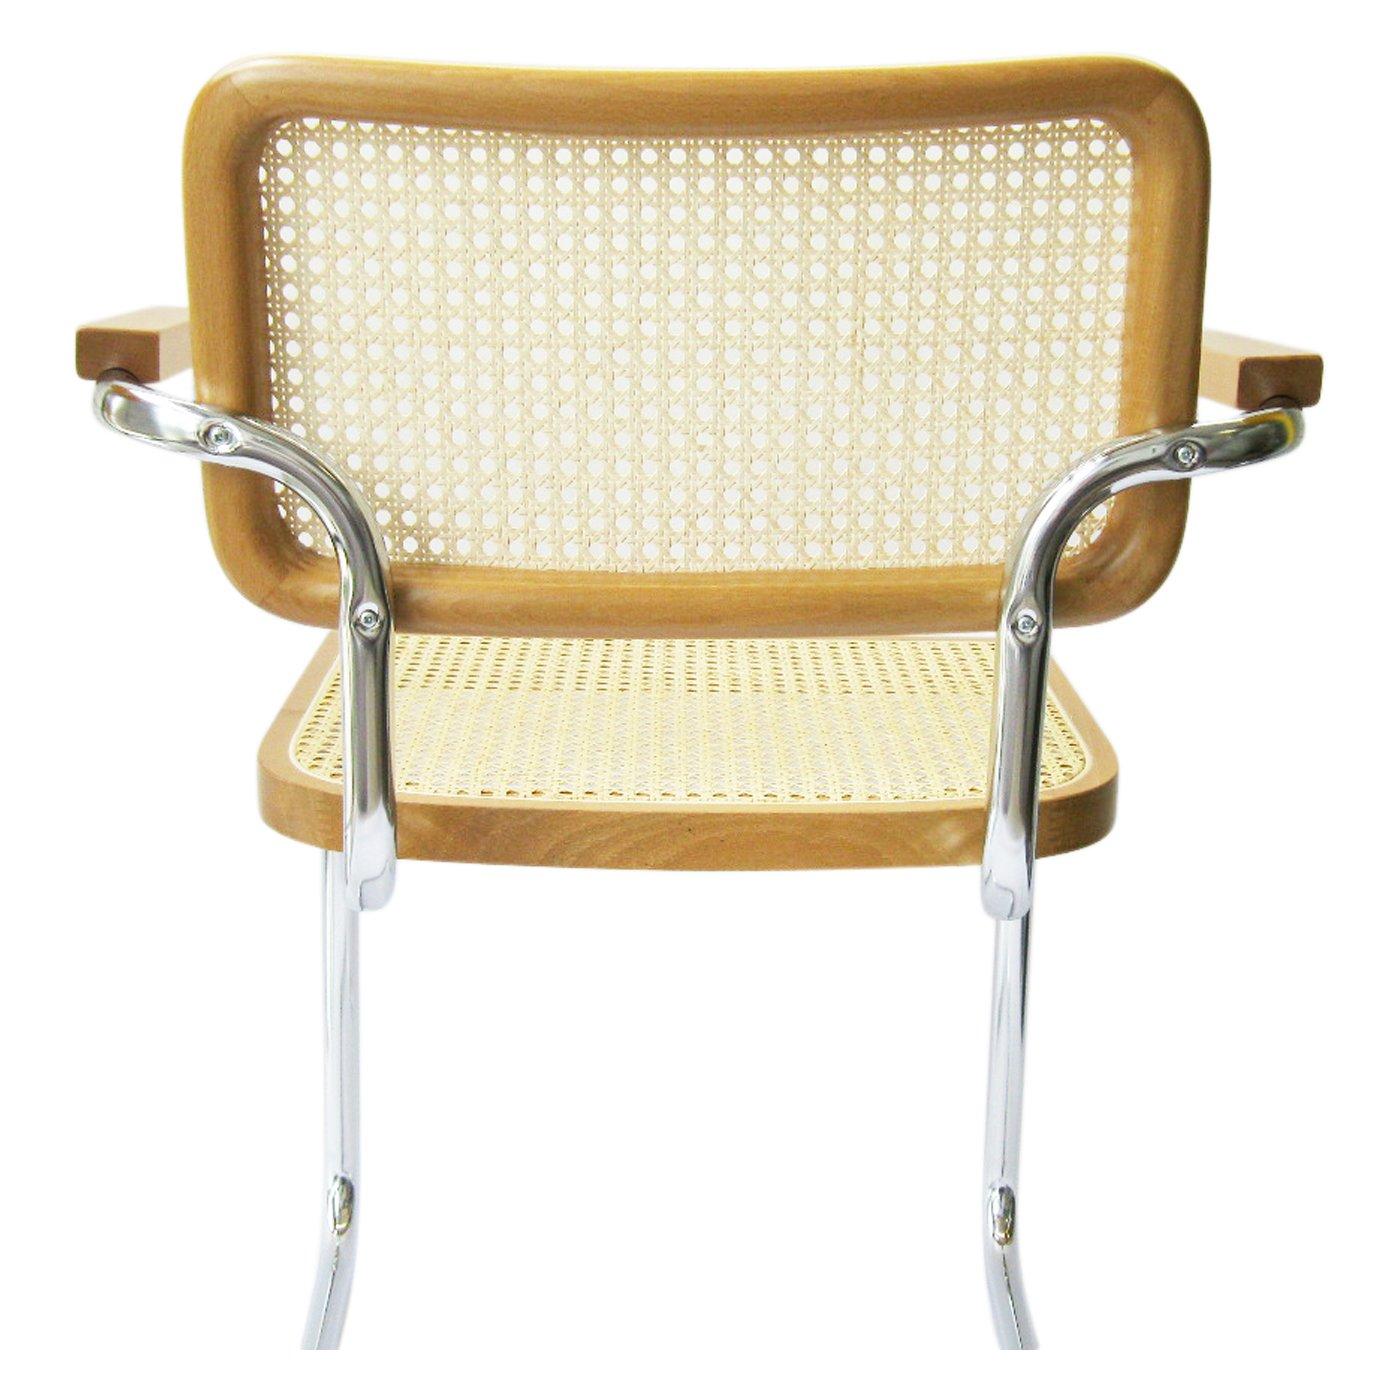 Amazon Marcel Breuer Cesca Cane Chrome Arm Chair in Honey